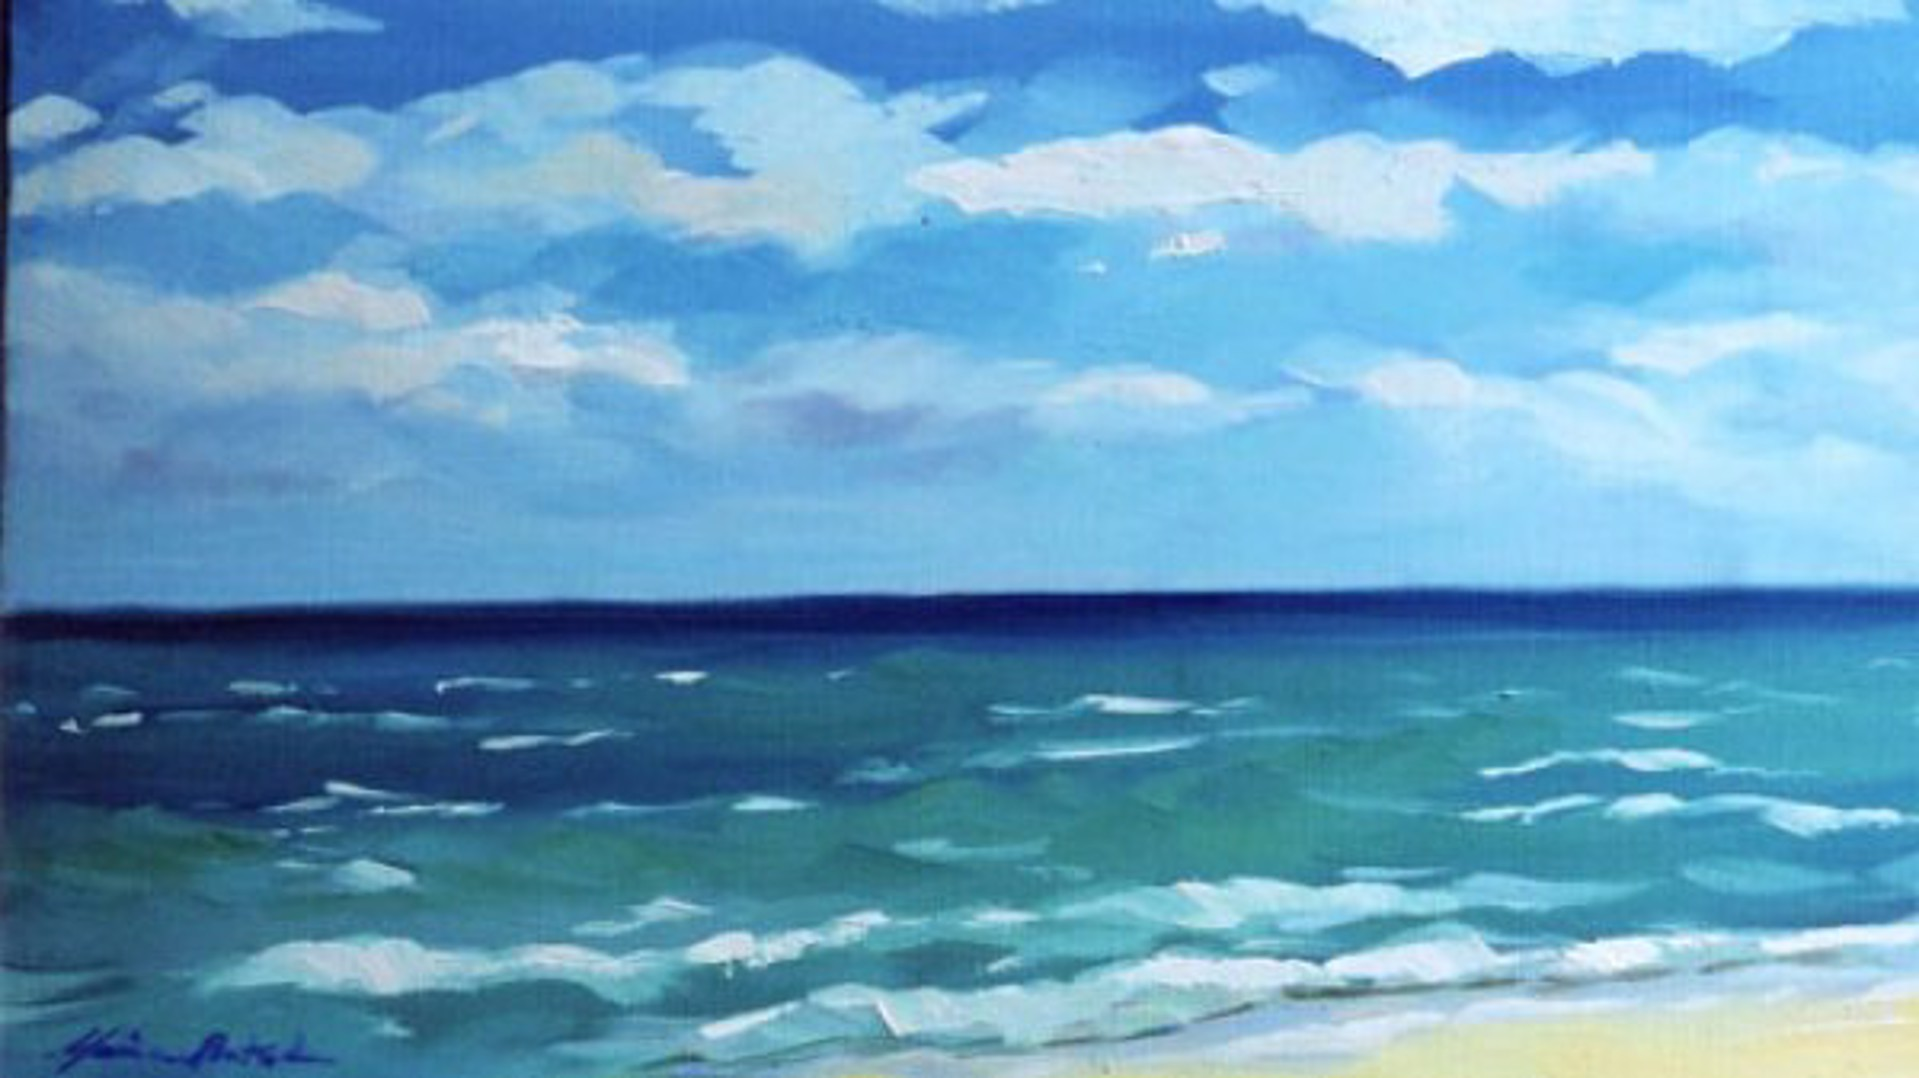 Bertran: Beach Day by Maria Bertrán